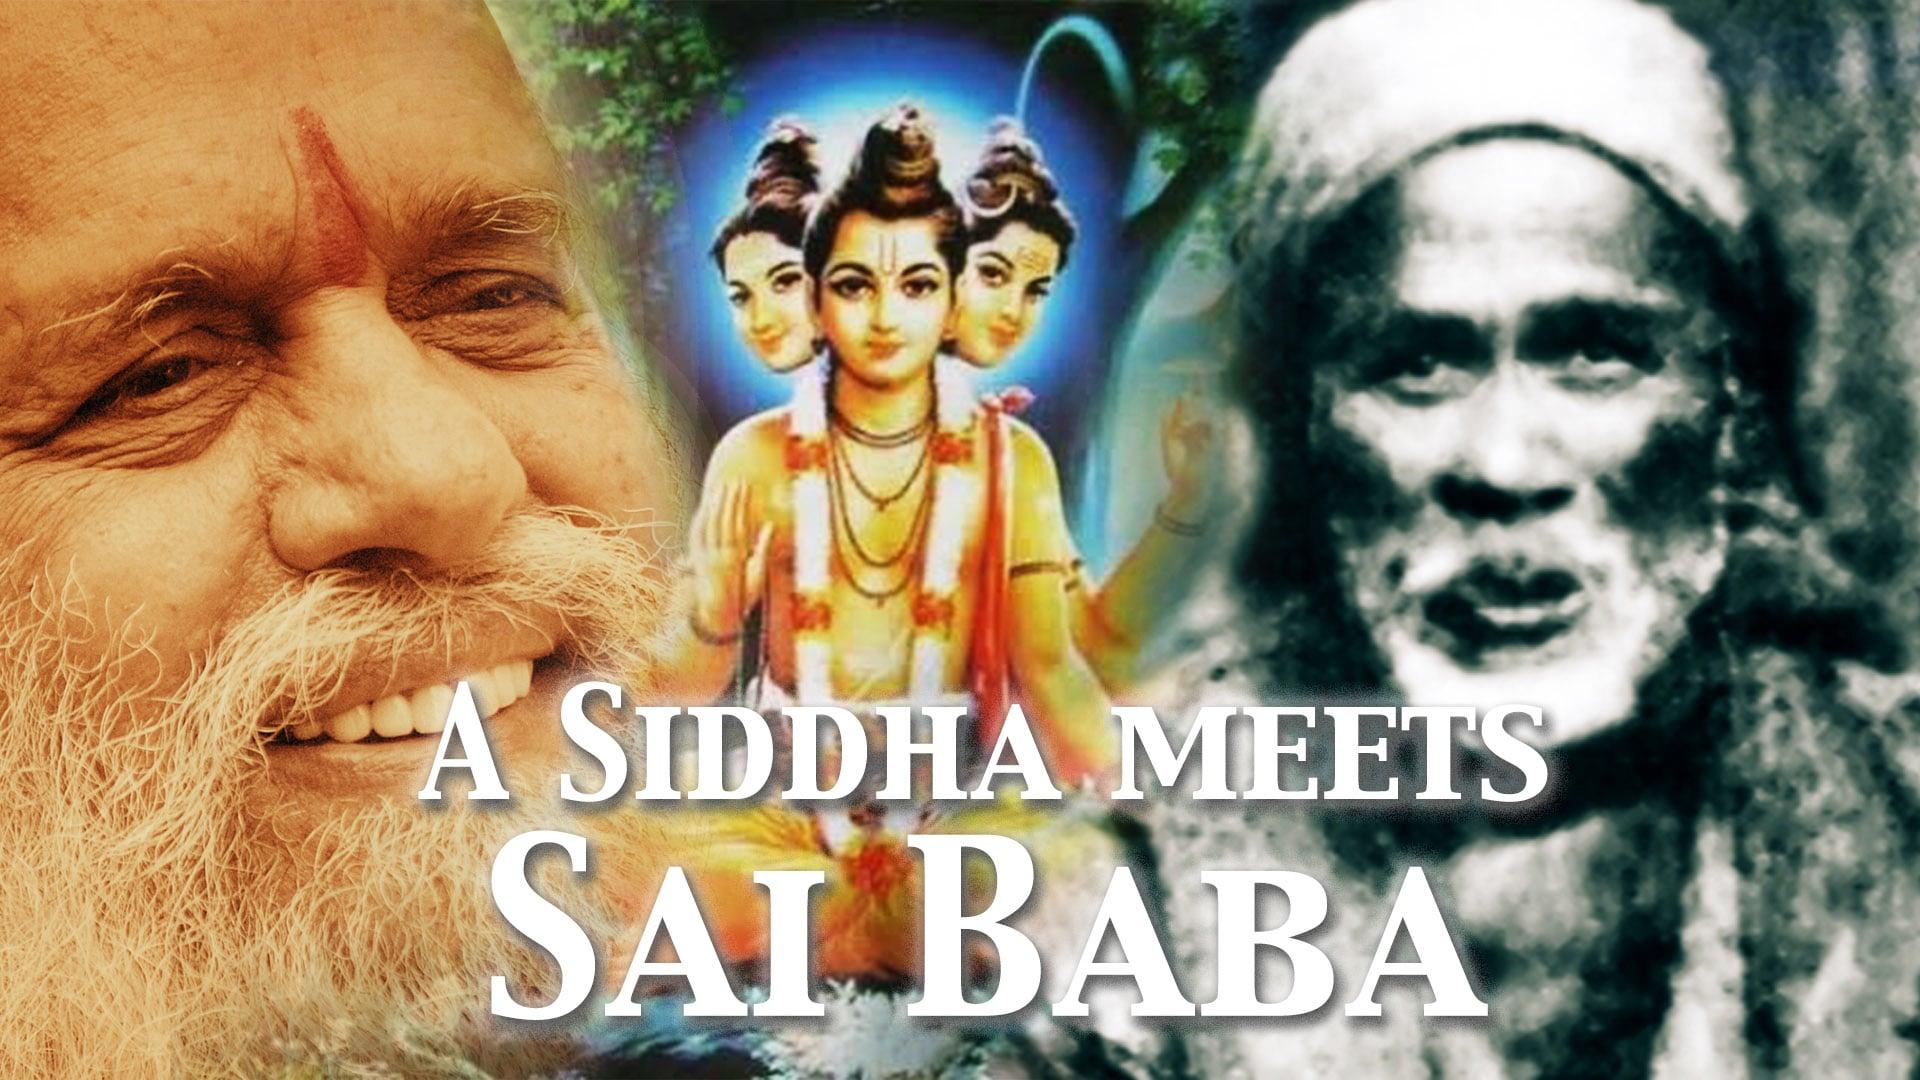 A Siddha meets Sai Baba